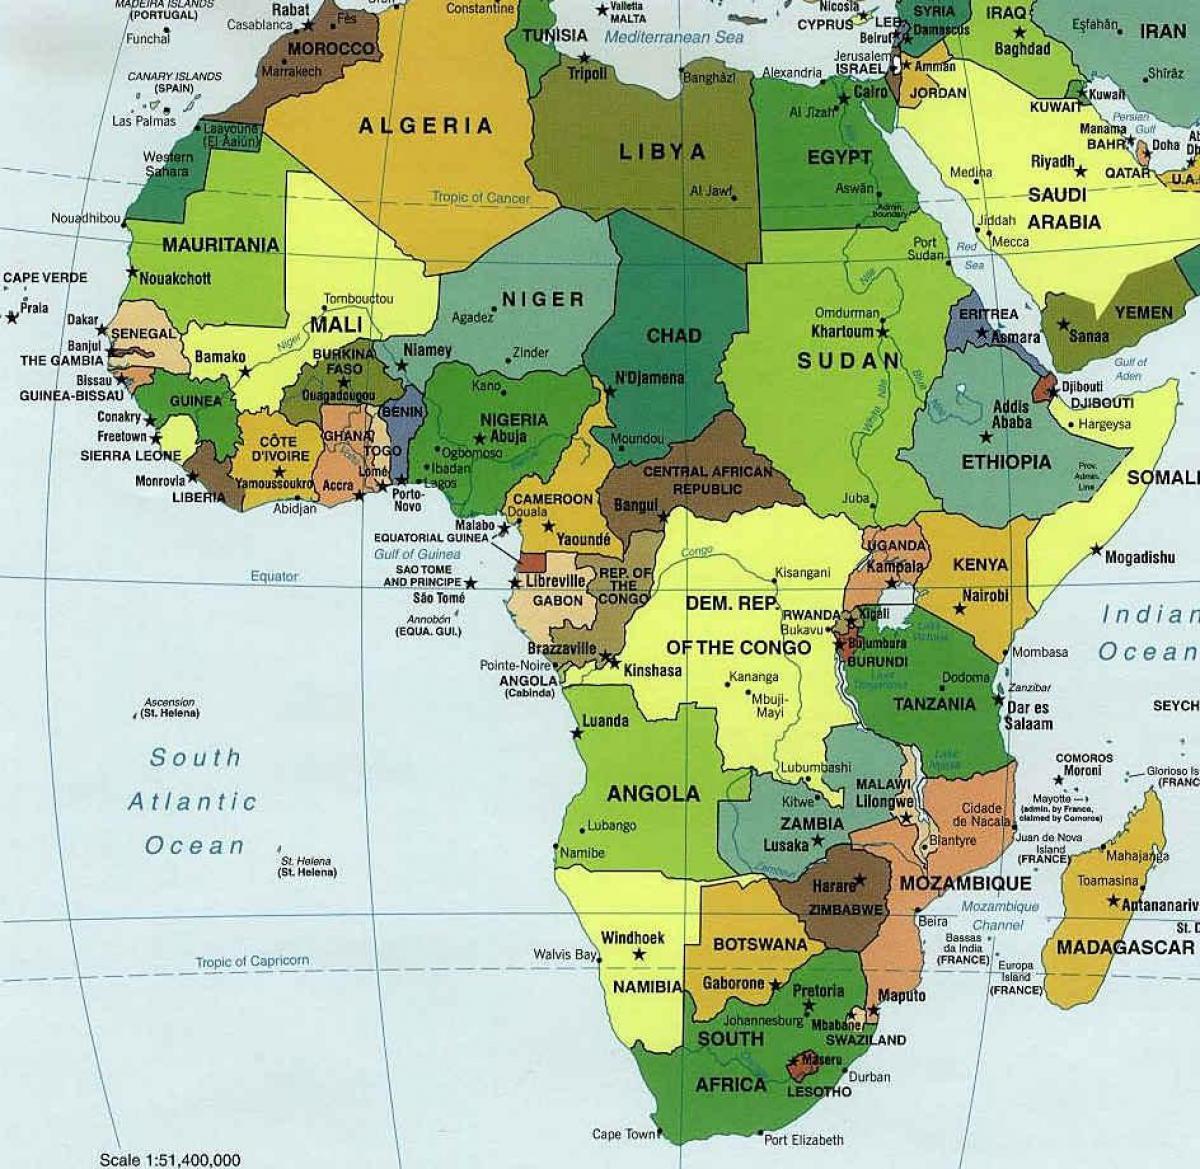 Zambia Og Sydafrika Kort Kort Over Zambia Og Sydafrika Ostlige